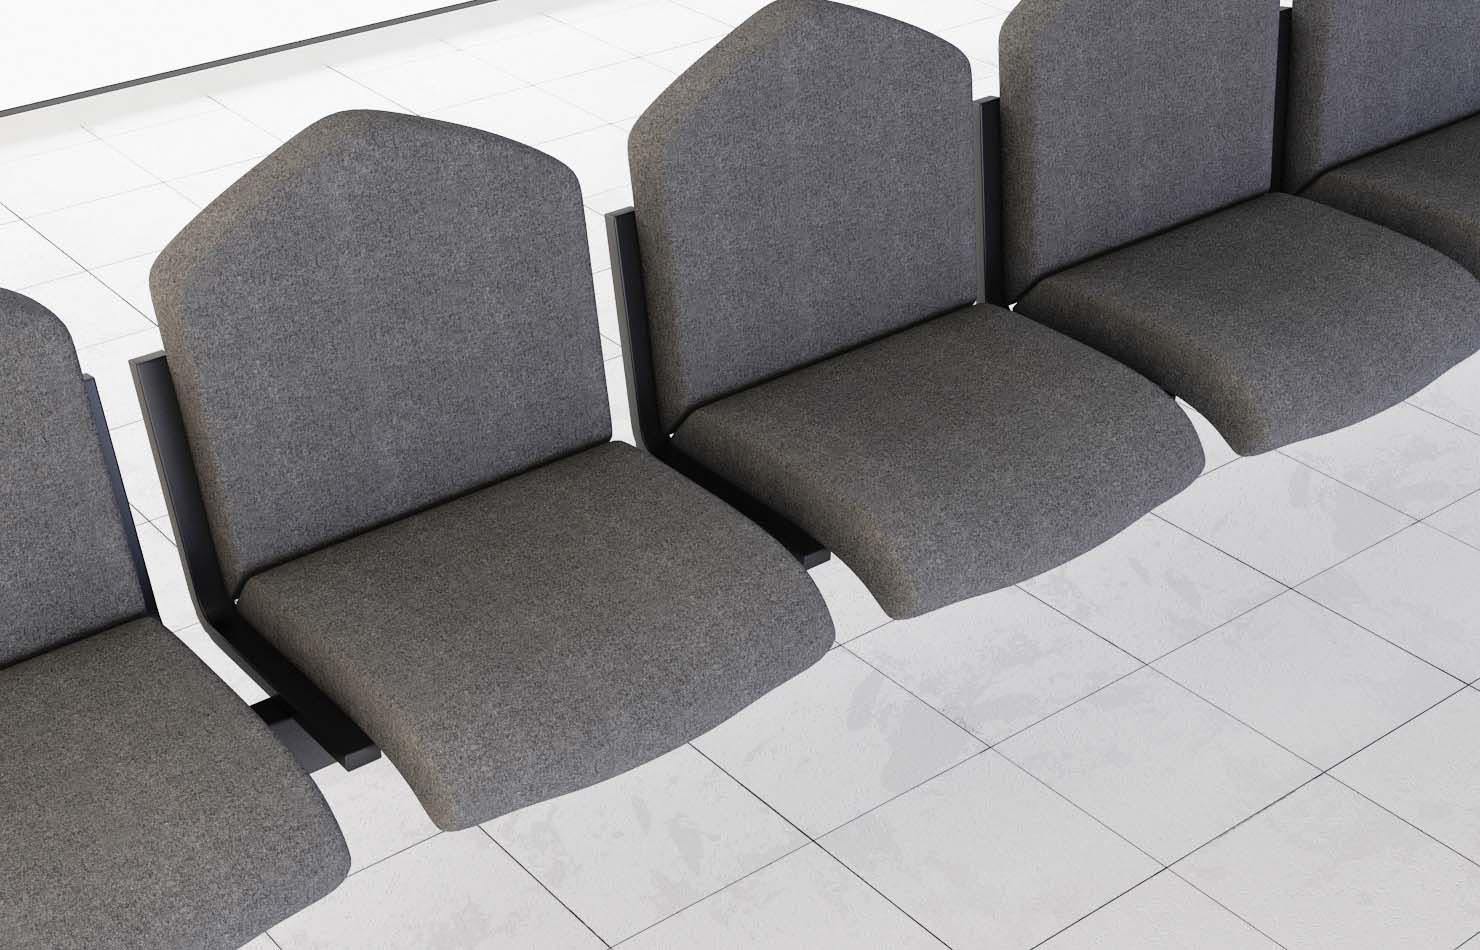 beam/bench seating – waiting room | richardsons office furniture